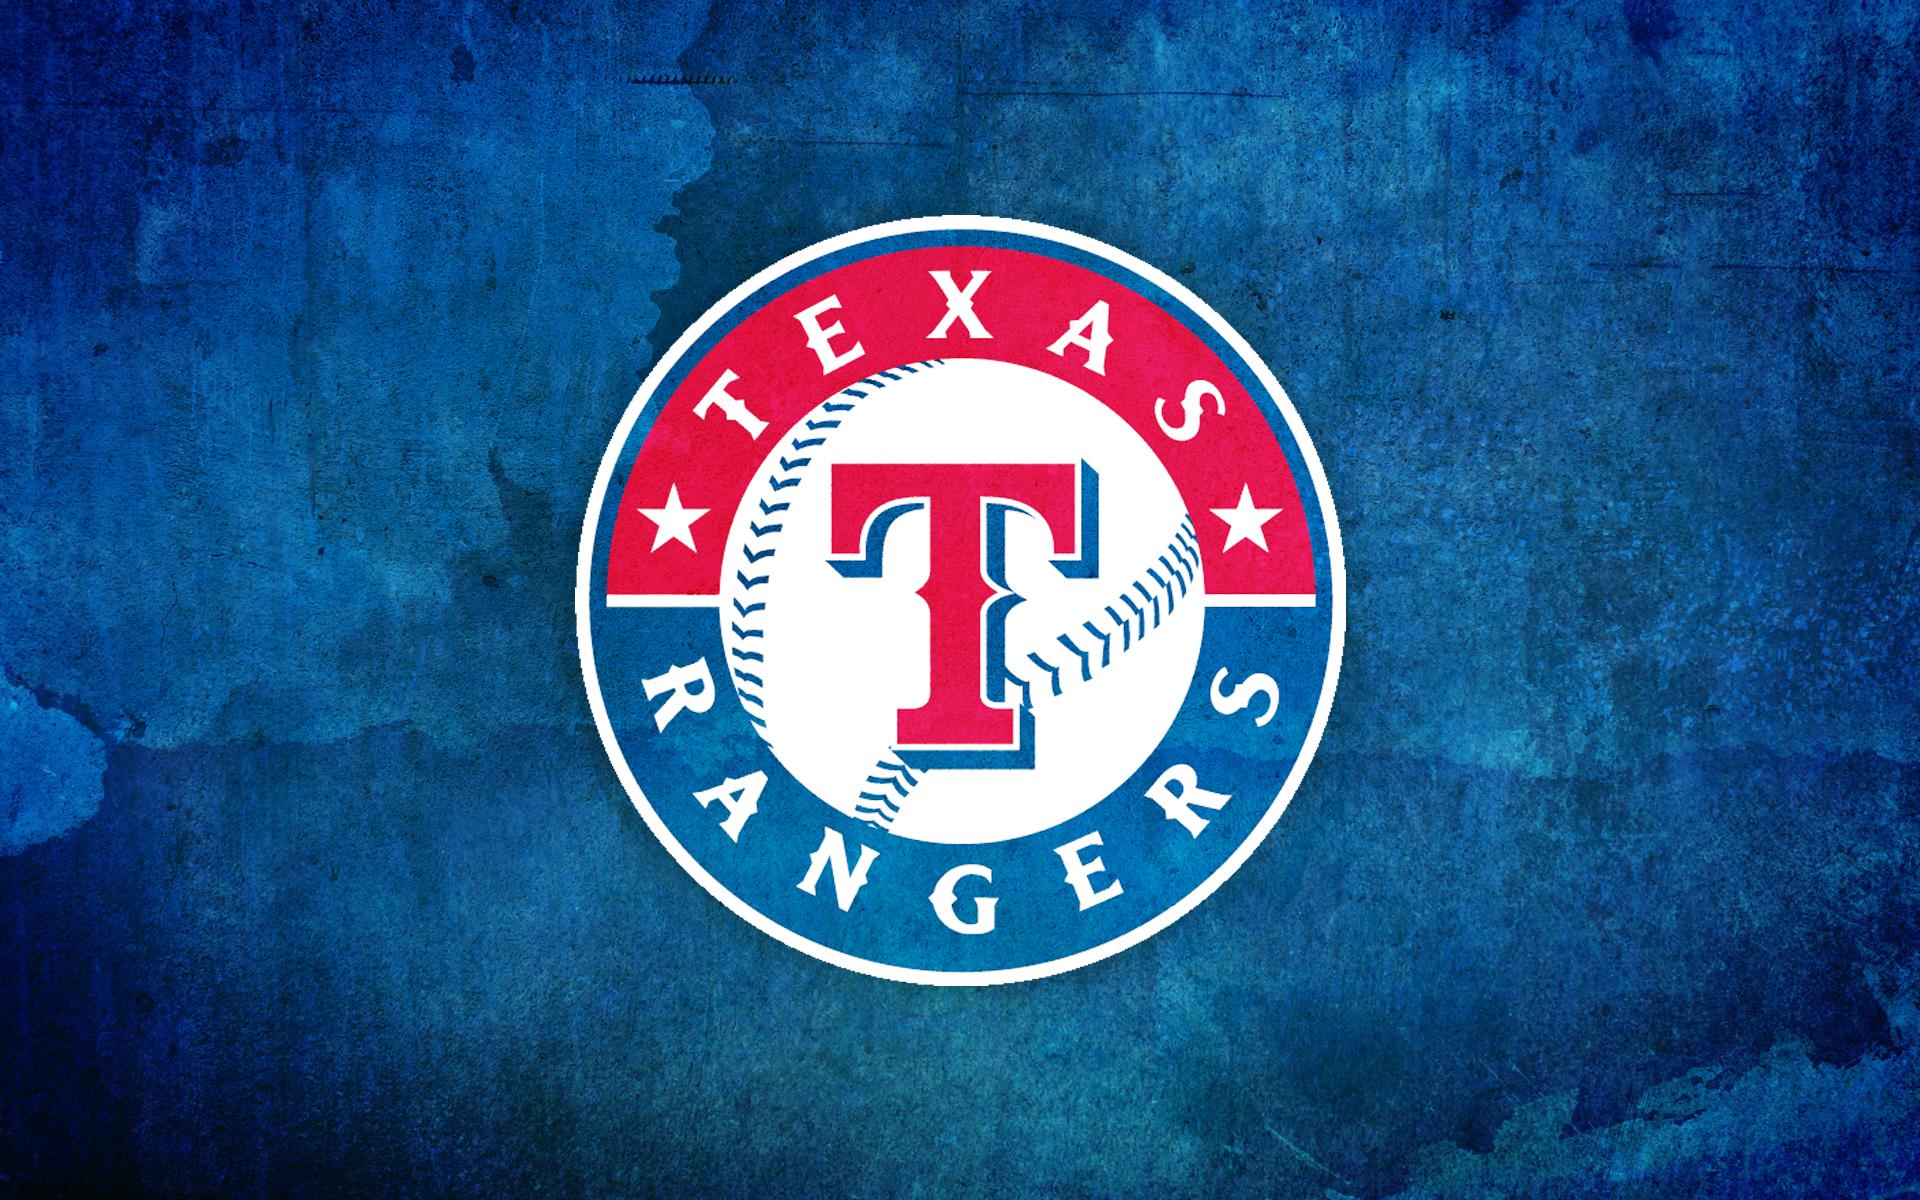 Texas Rangers 1920 x 1200 1024 x 640 1920x1200